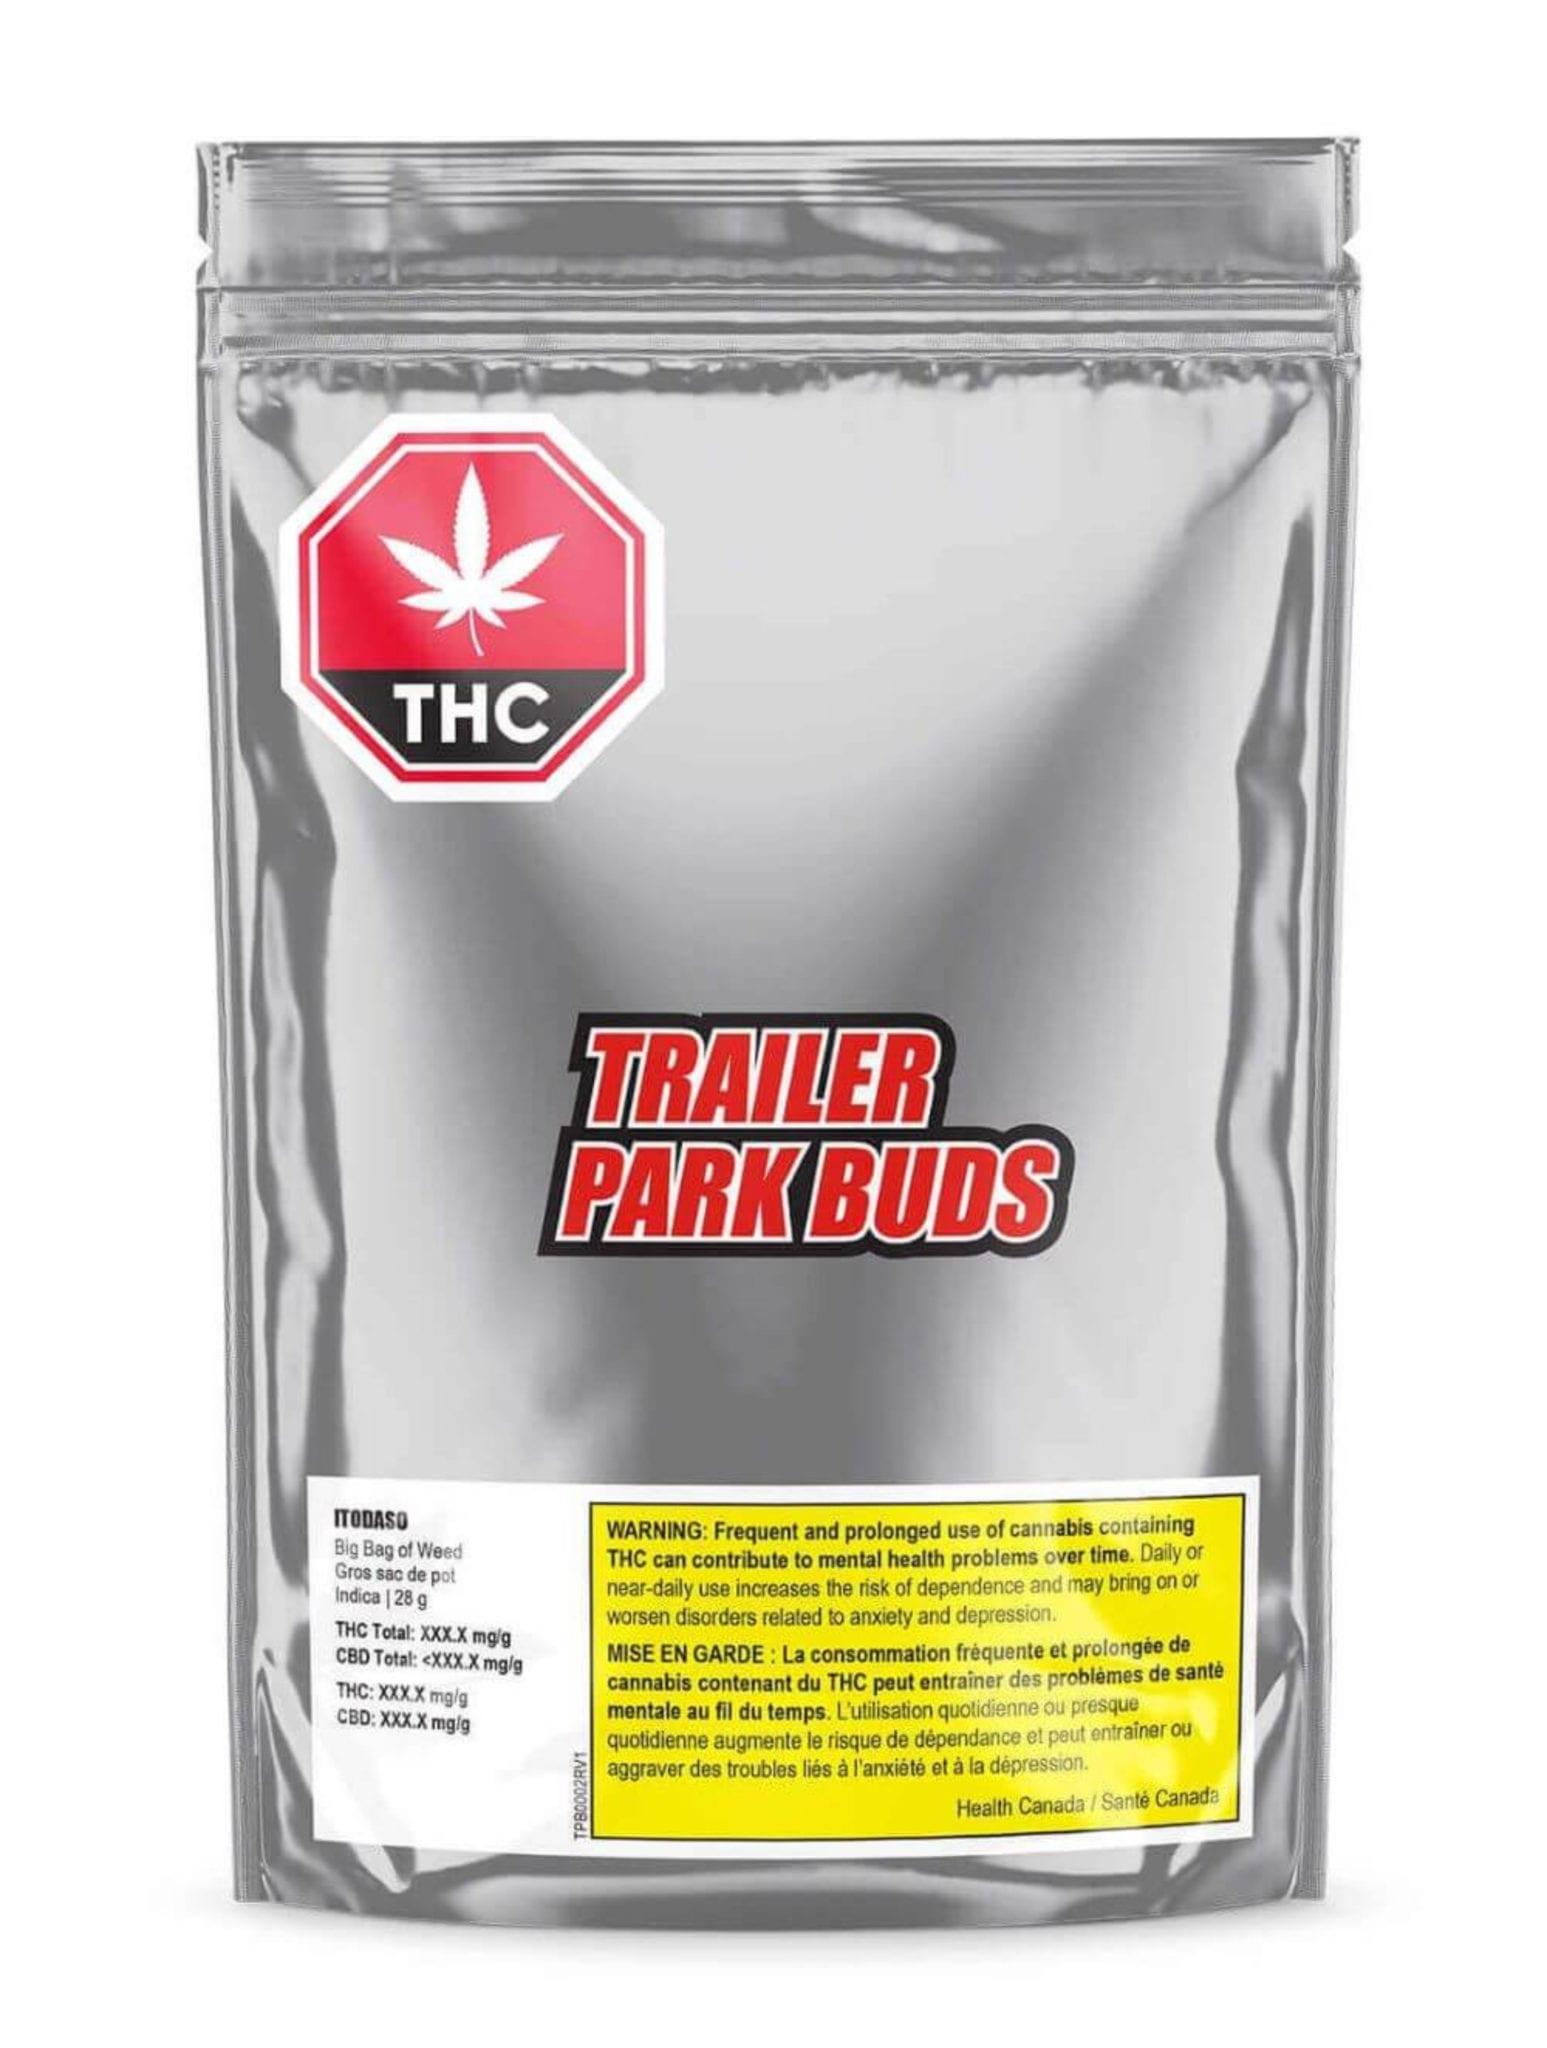 Trailer Park Buds